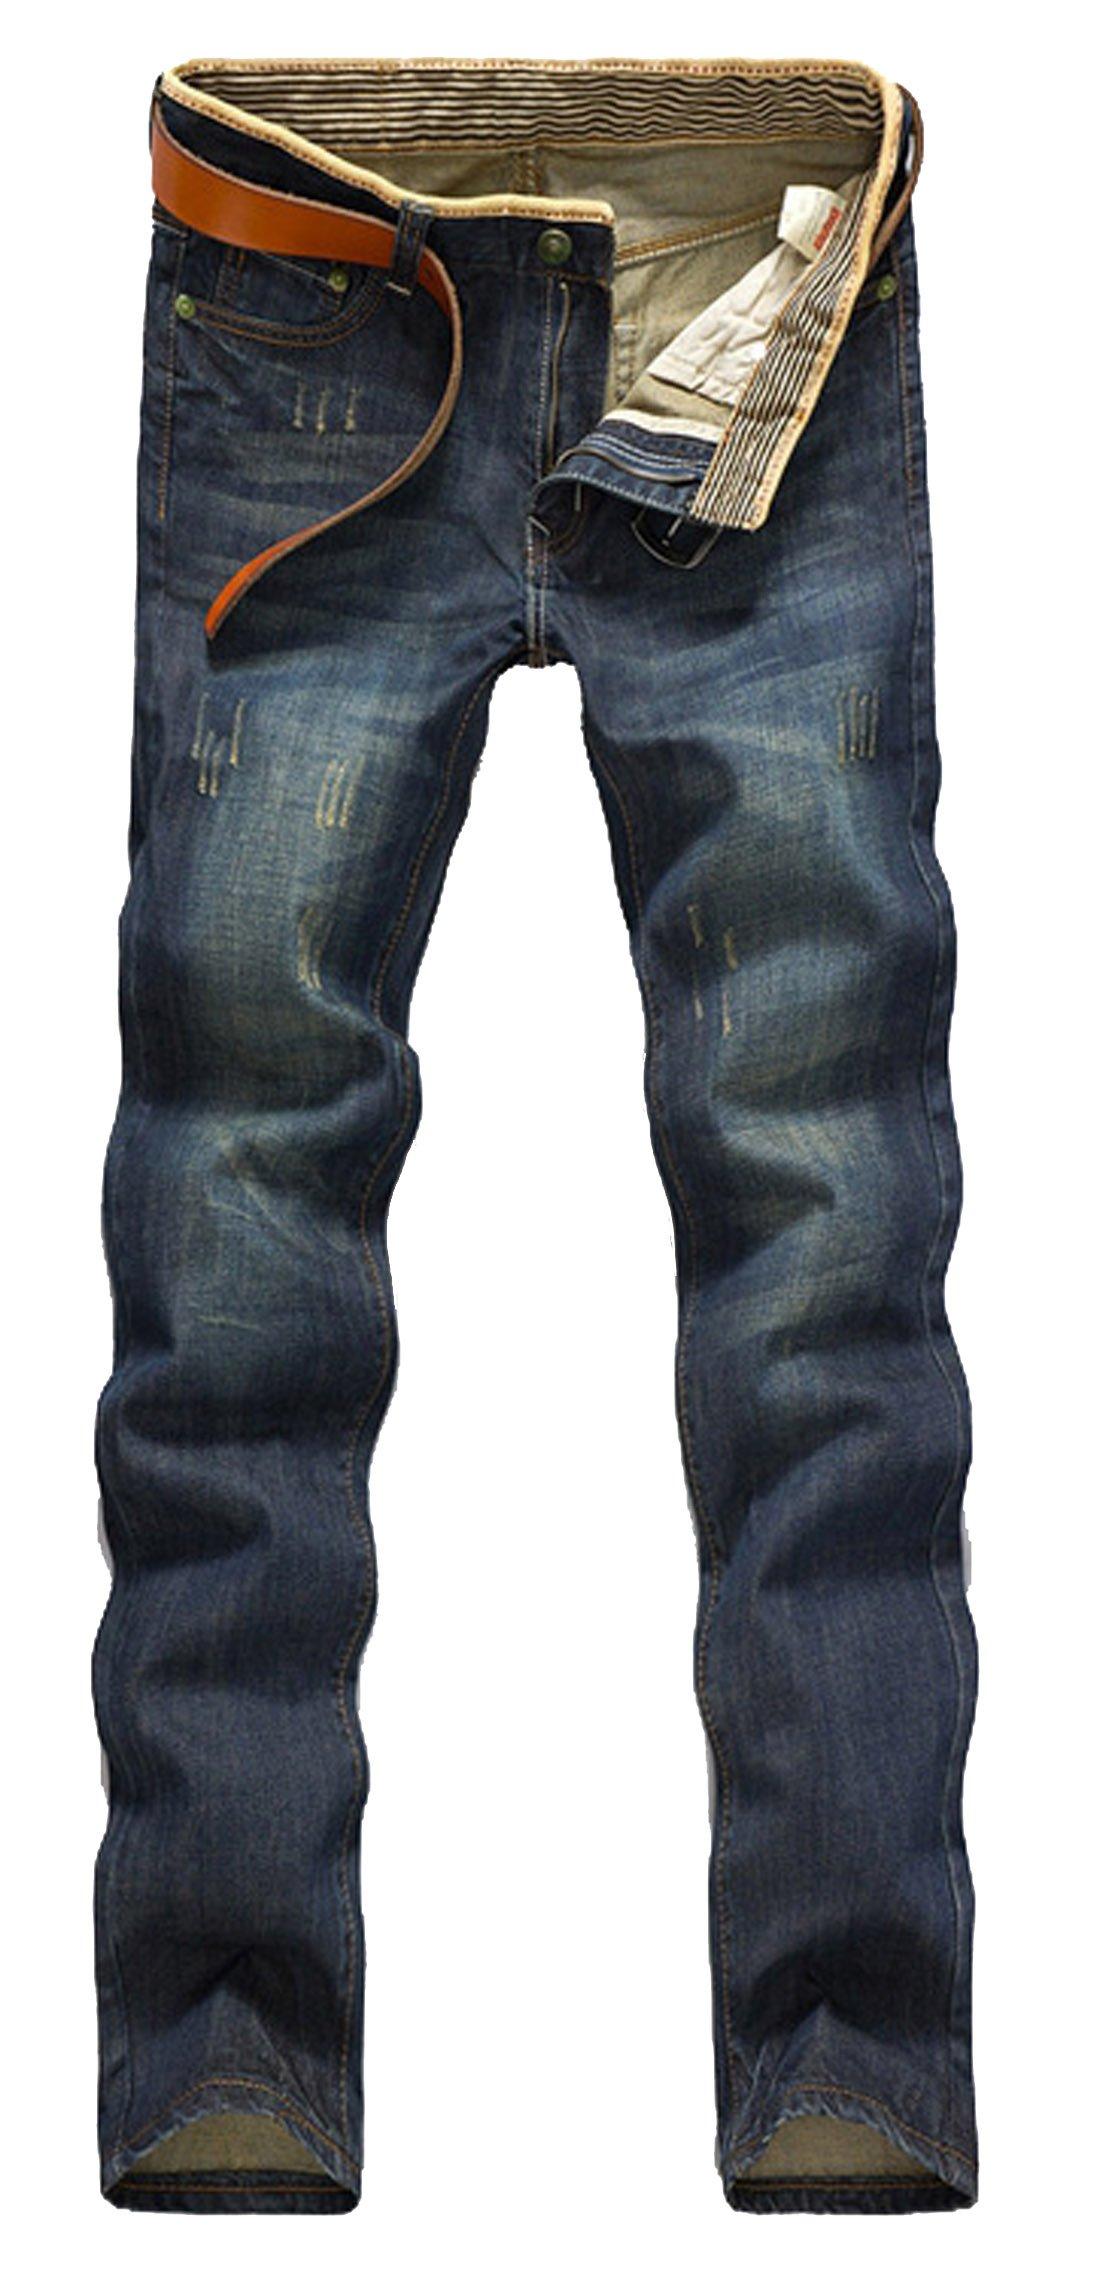 OCCUPY Maxhoc Men's Stylish Slim Fit Straight Leg Jeans Trousers (32)